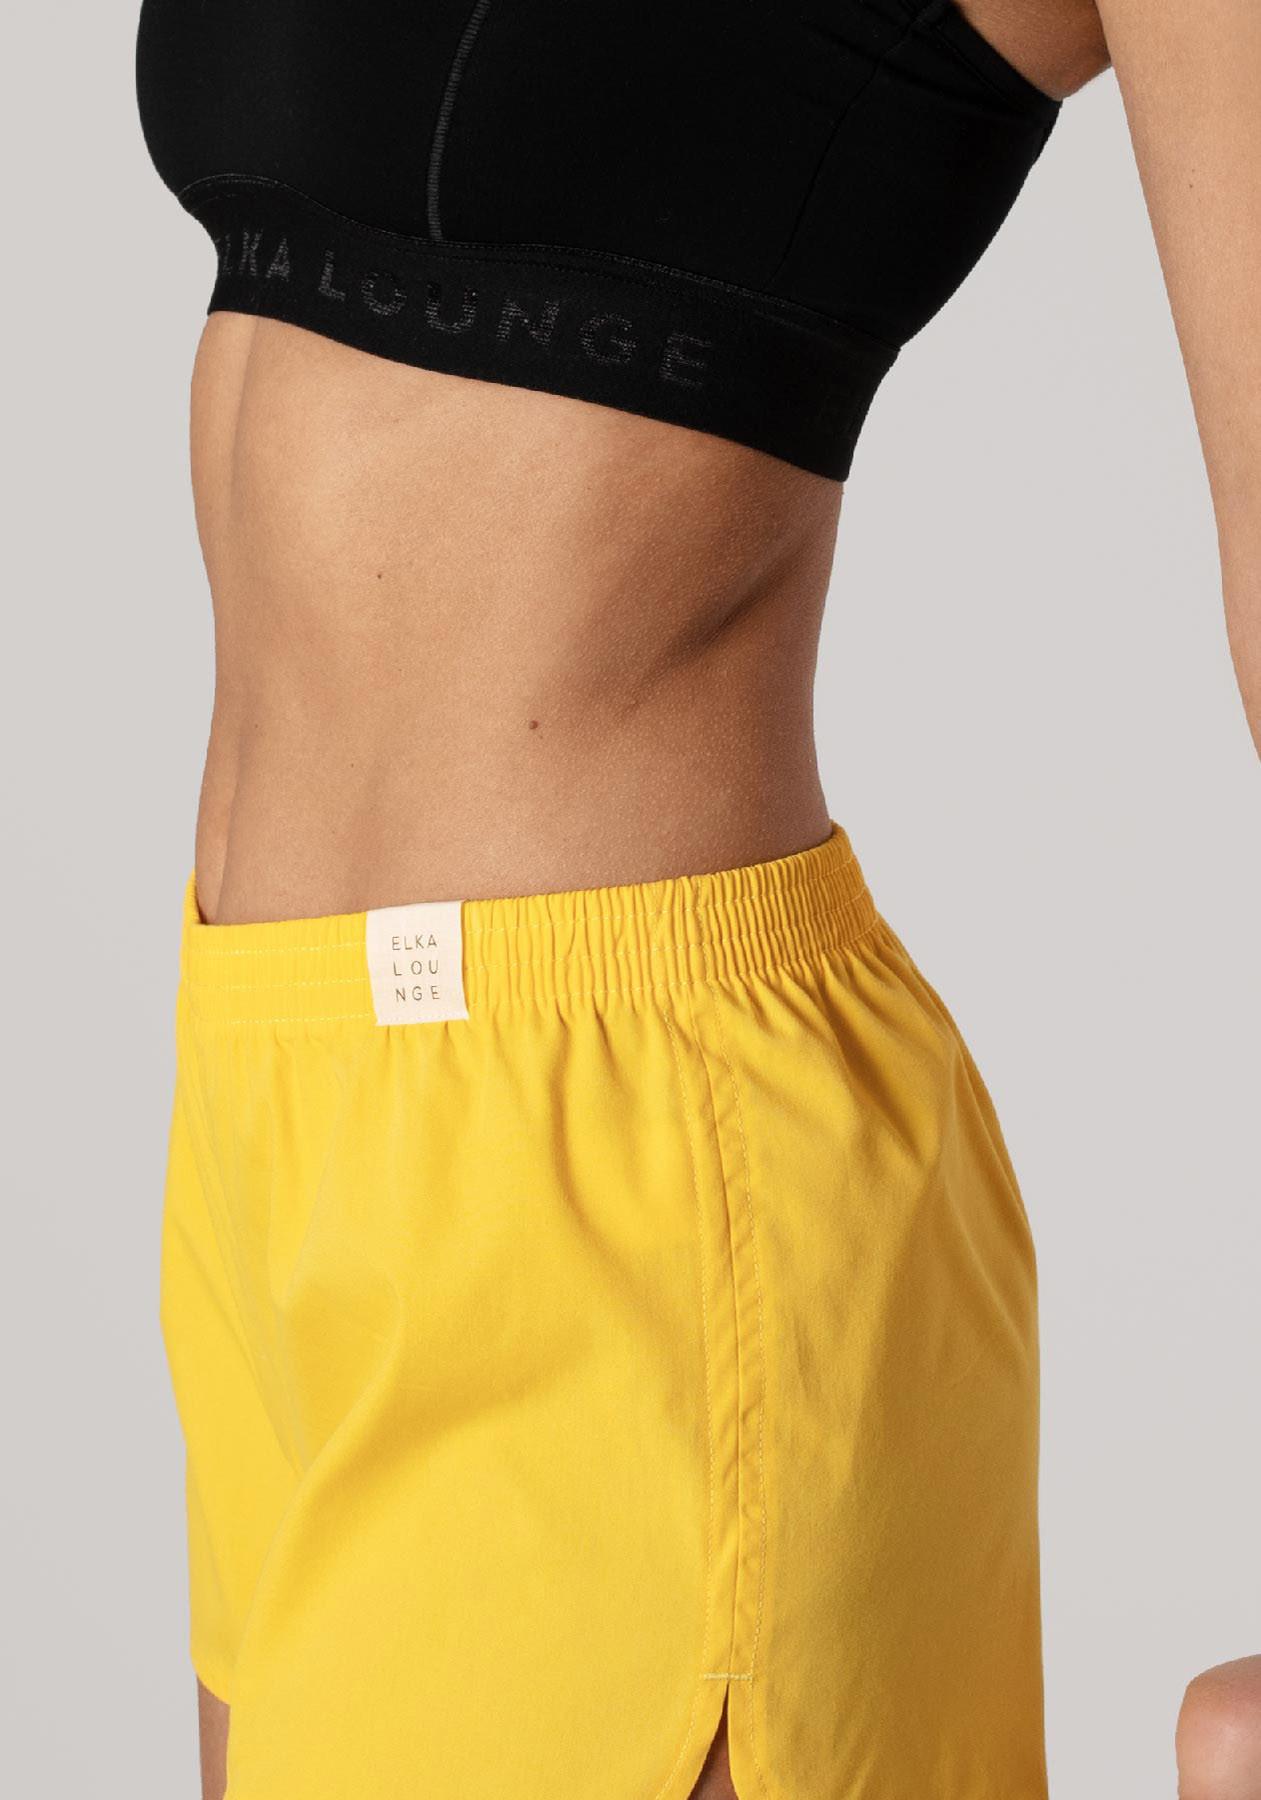 Women-boxershorts-ELKA-Lounge-W00589